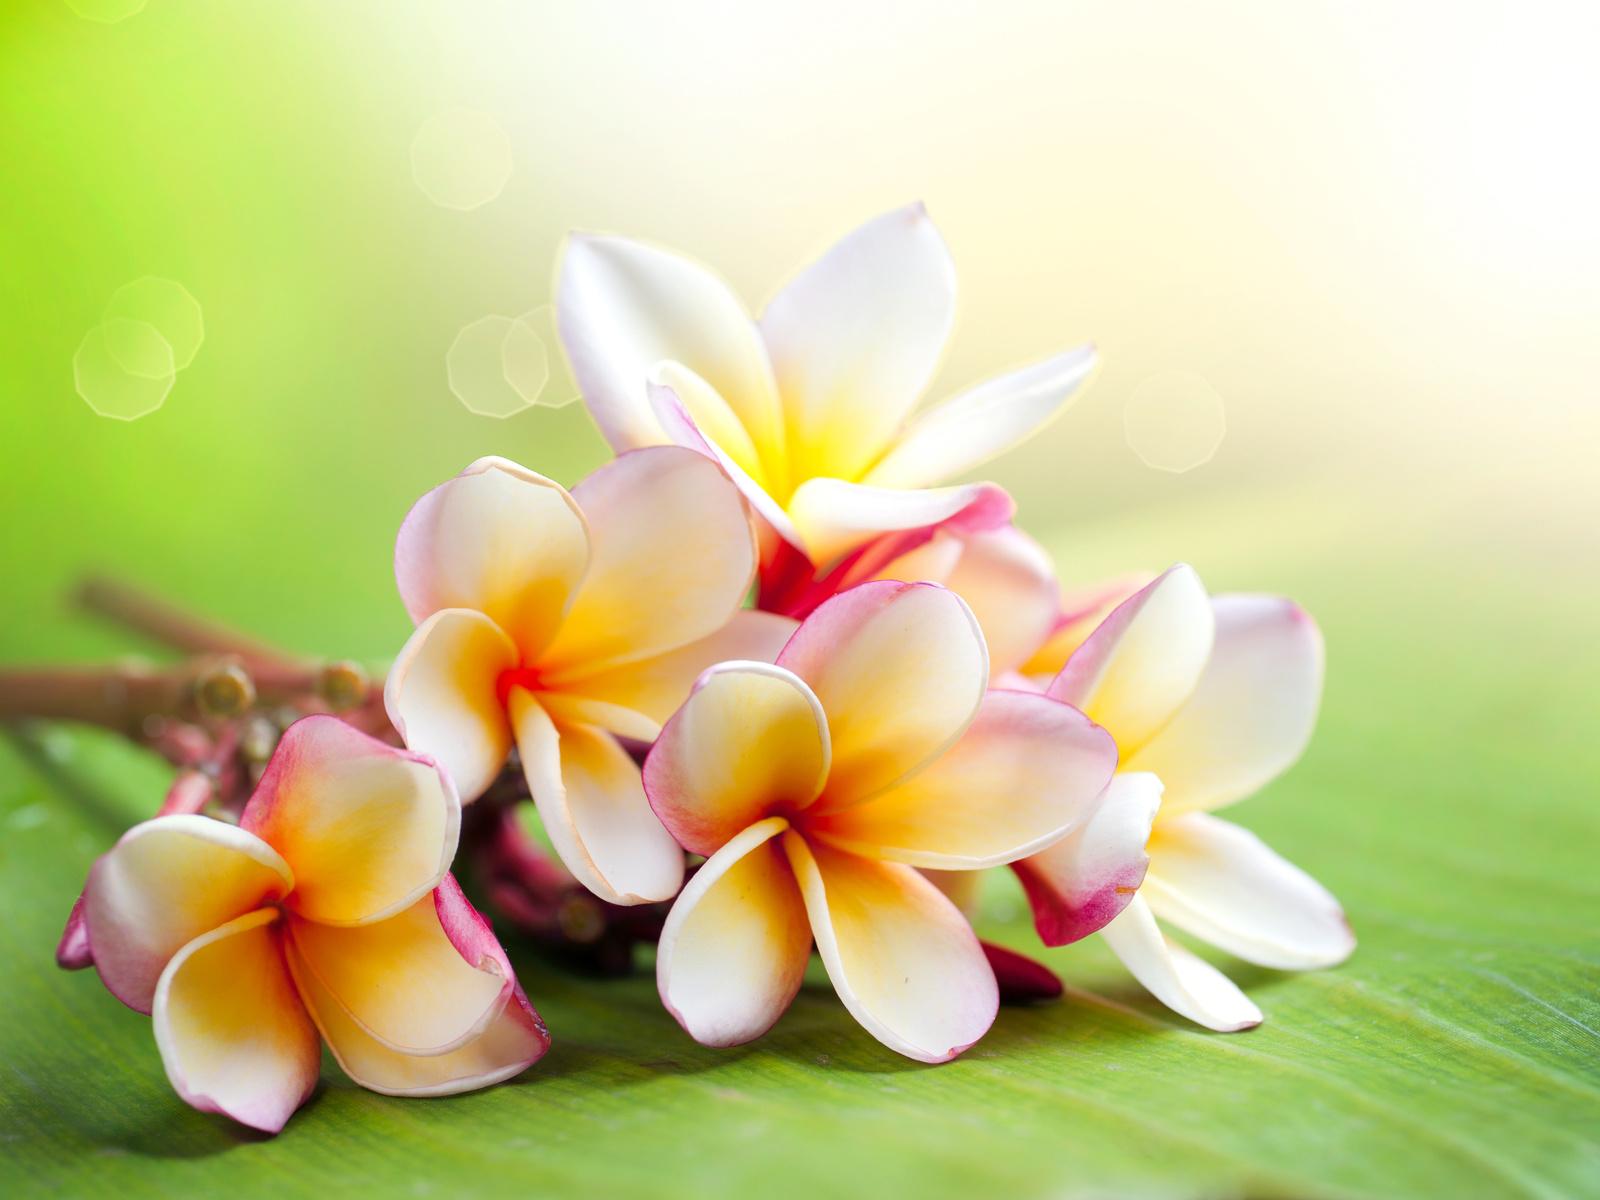 Hawaiian Flower Wallpaper 1600x1200